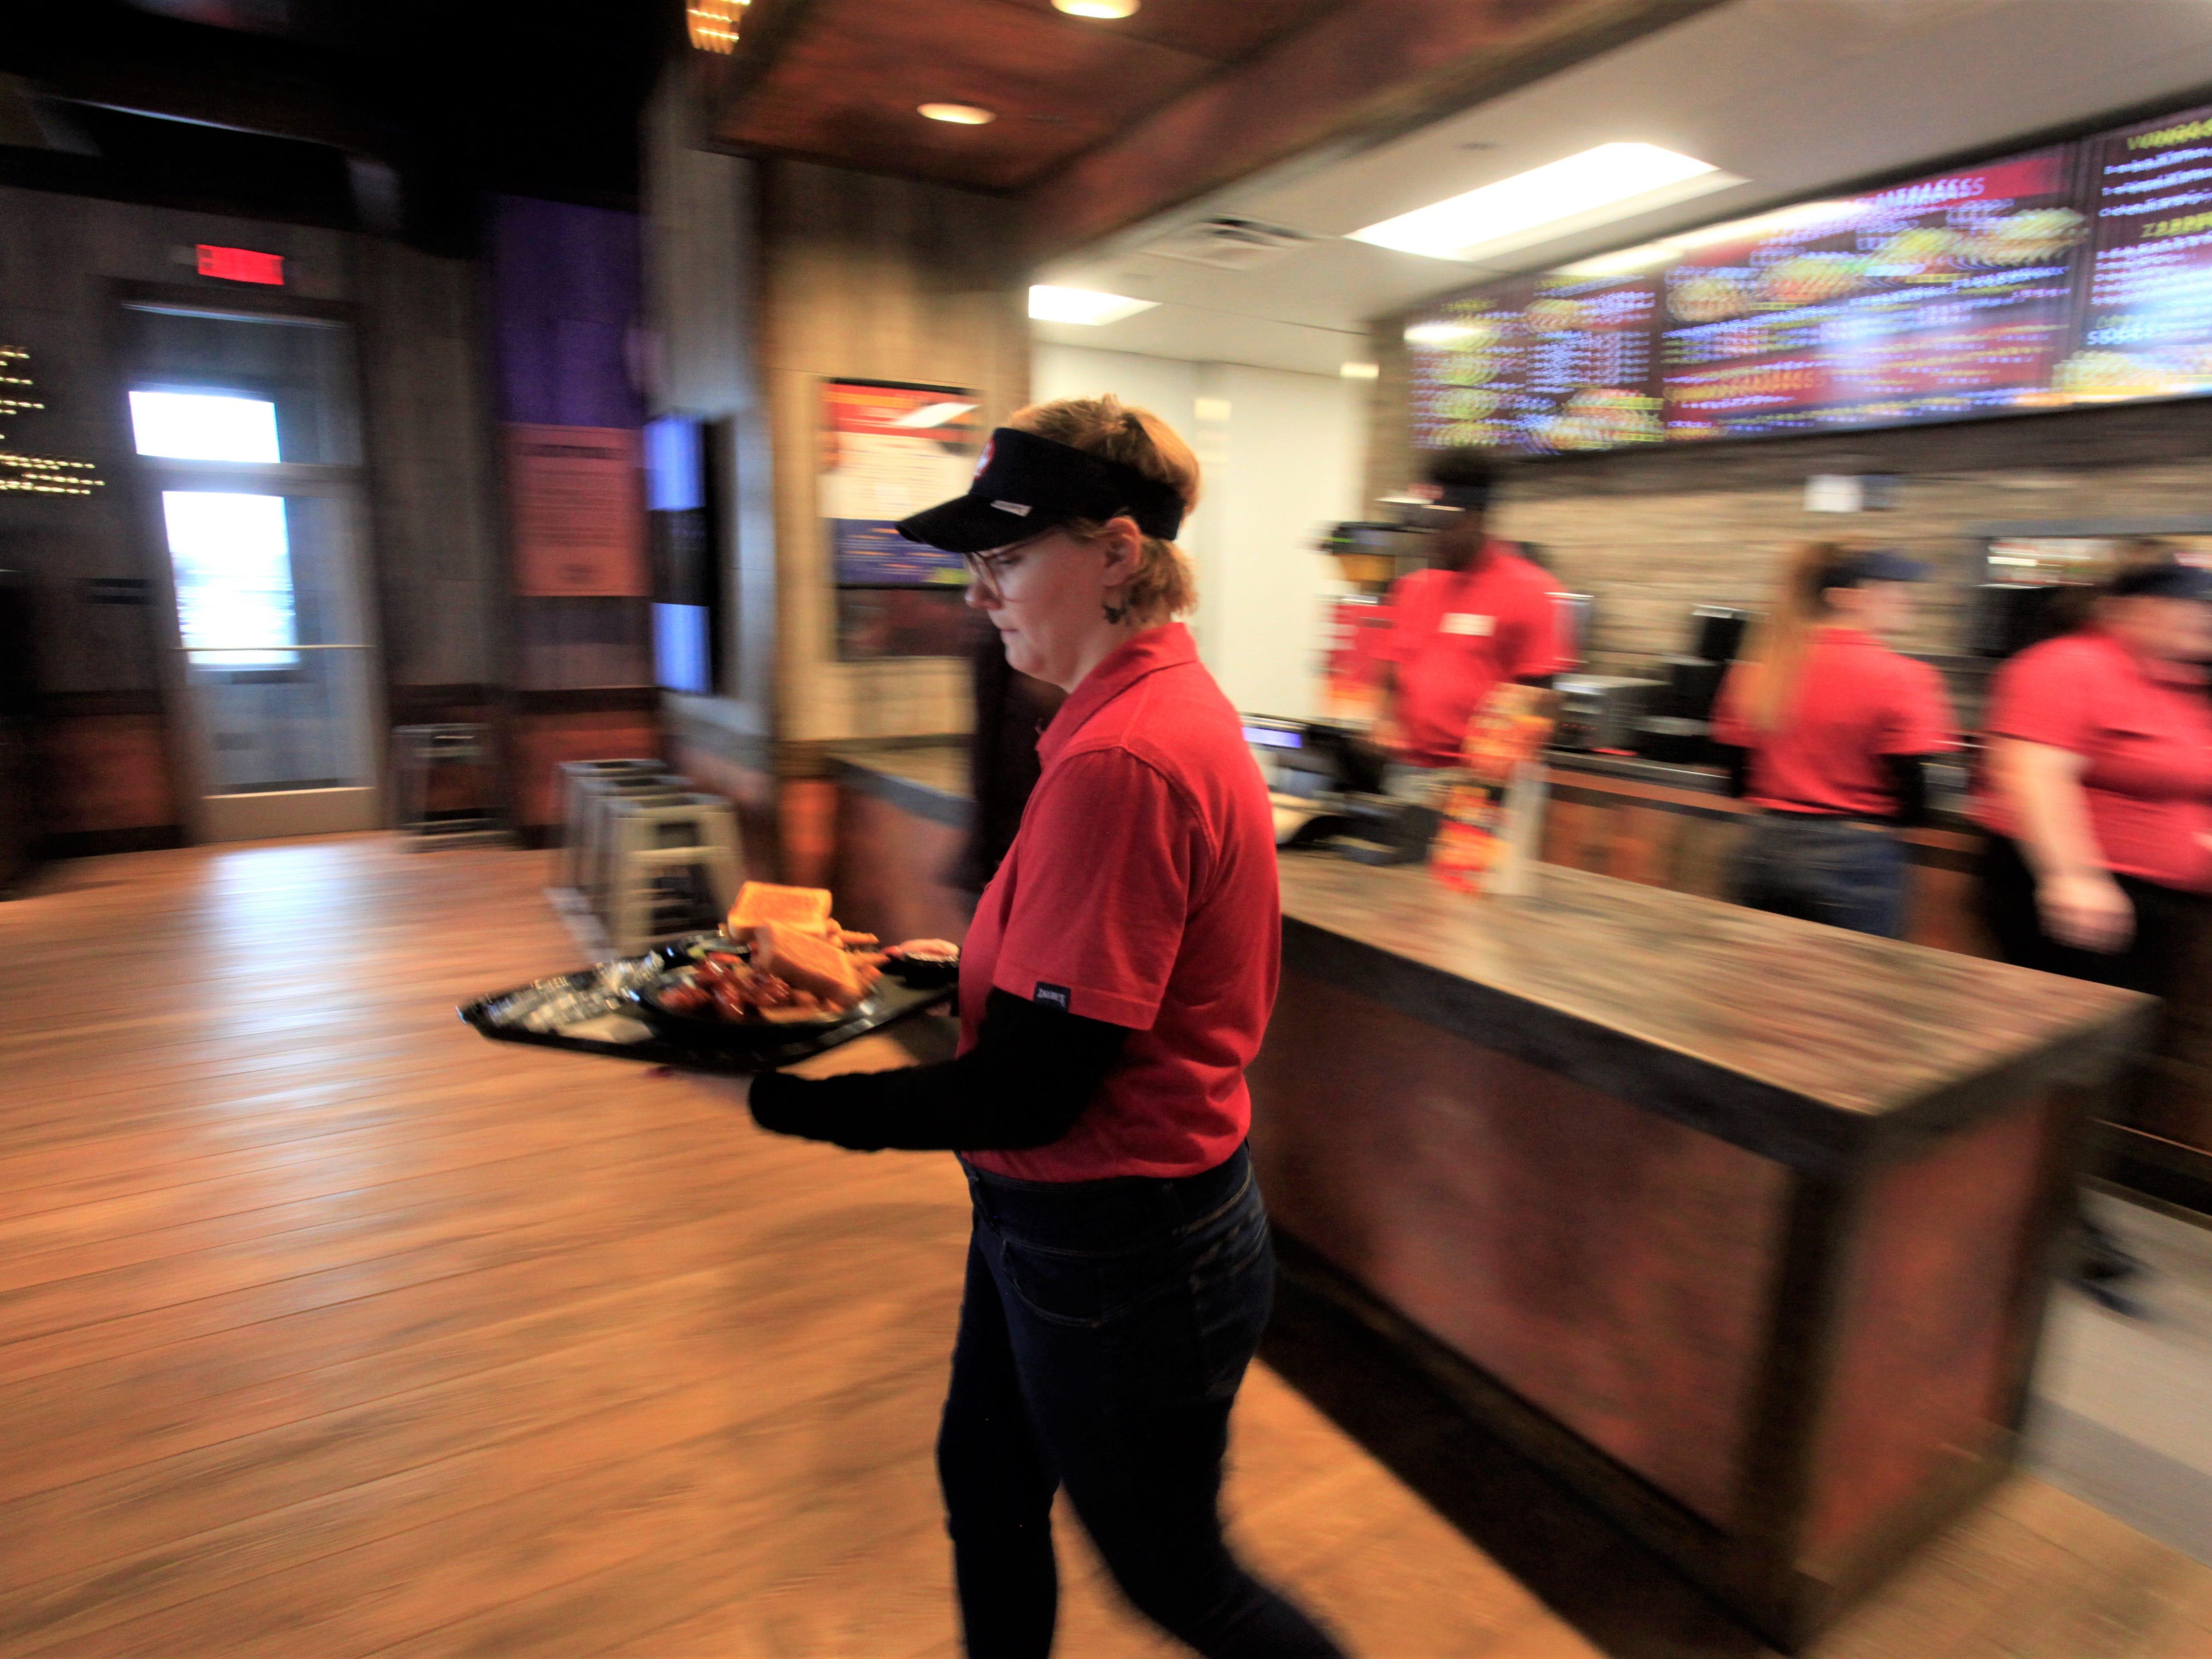 Karen Aguirre serves food at Zaxby's.